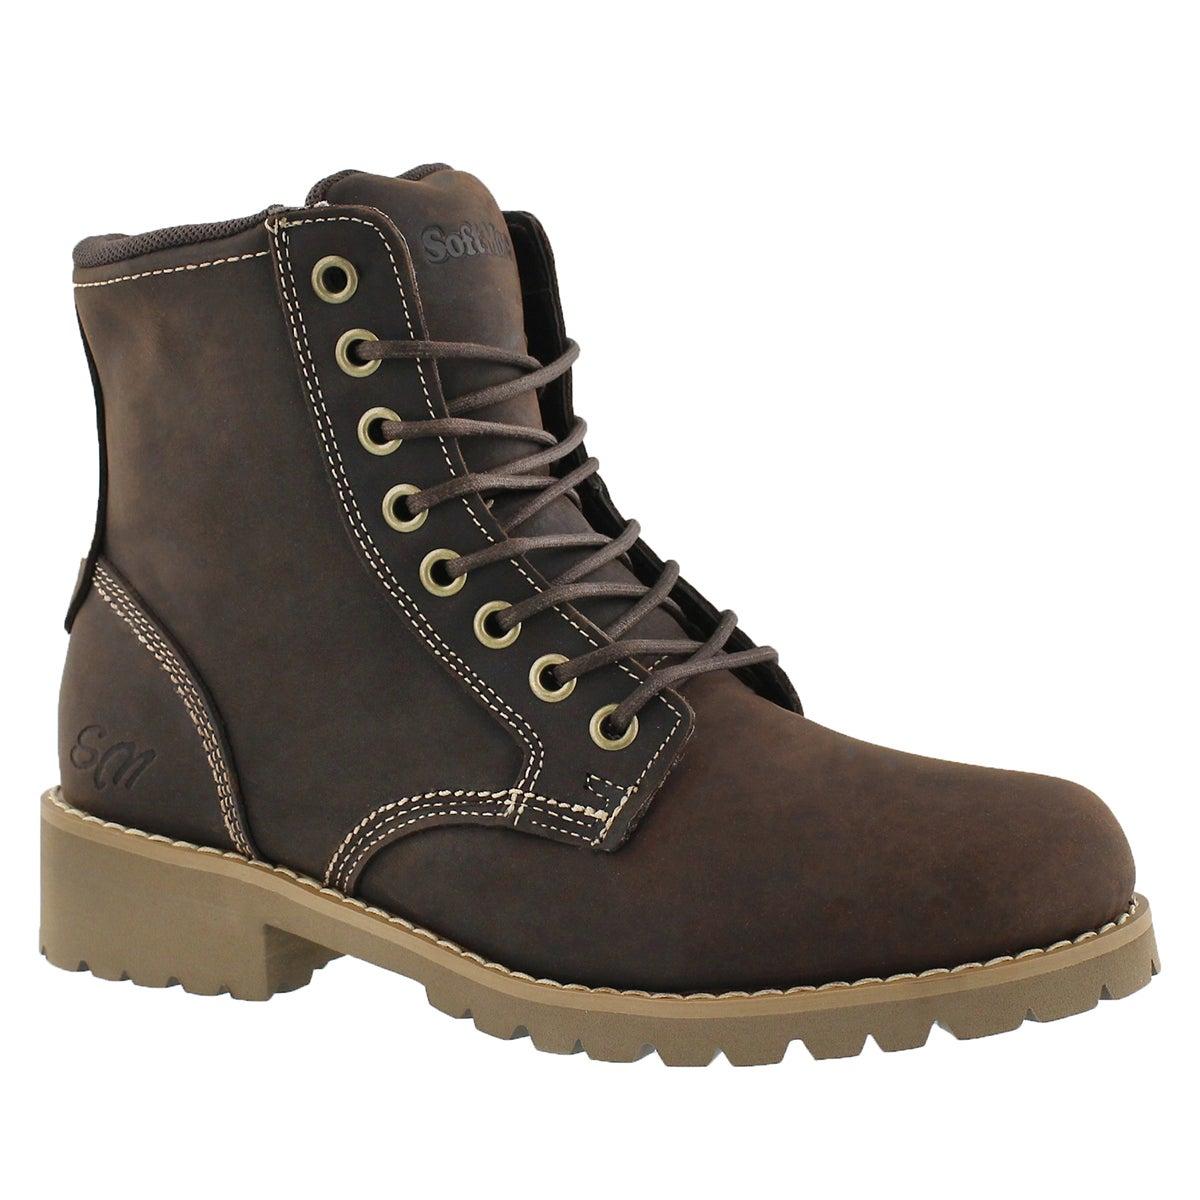 Women's DALISSE dark brown casual combat boots